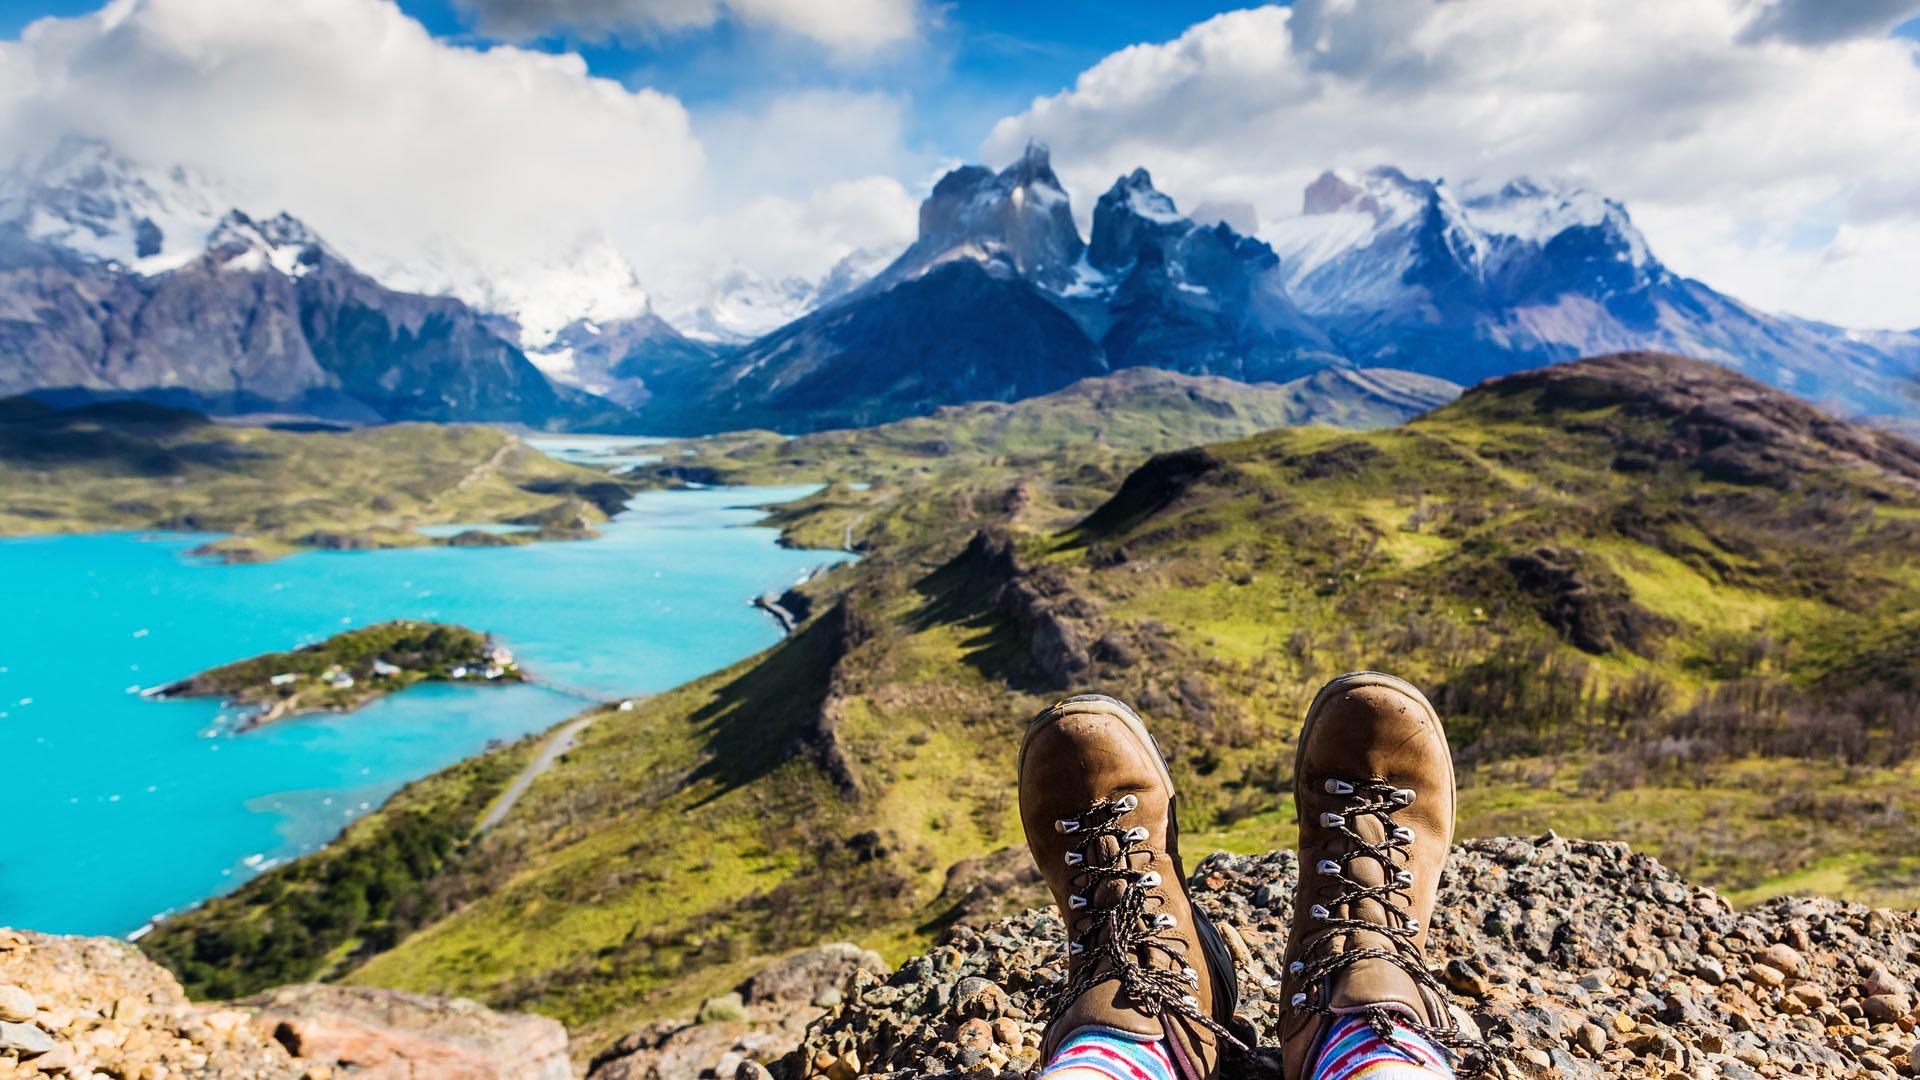 Chile | Patagonien | ©Olga Danylenko/Shutterstock.com